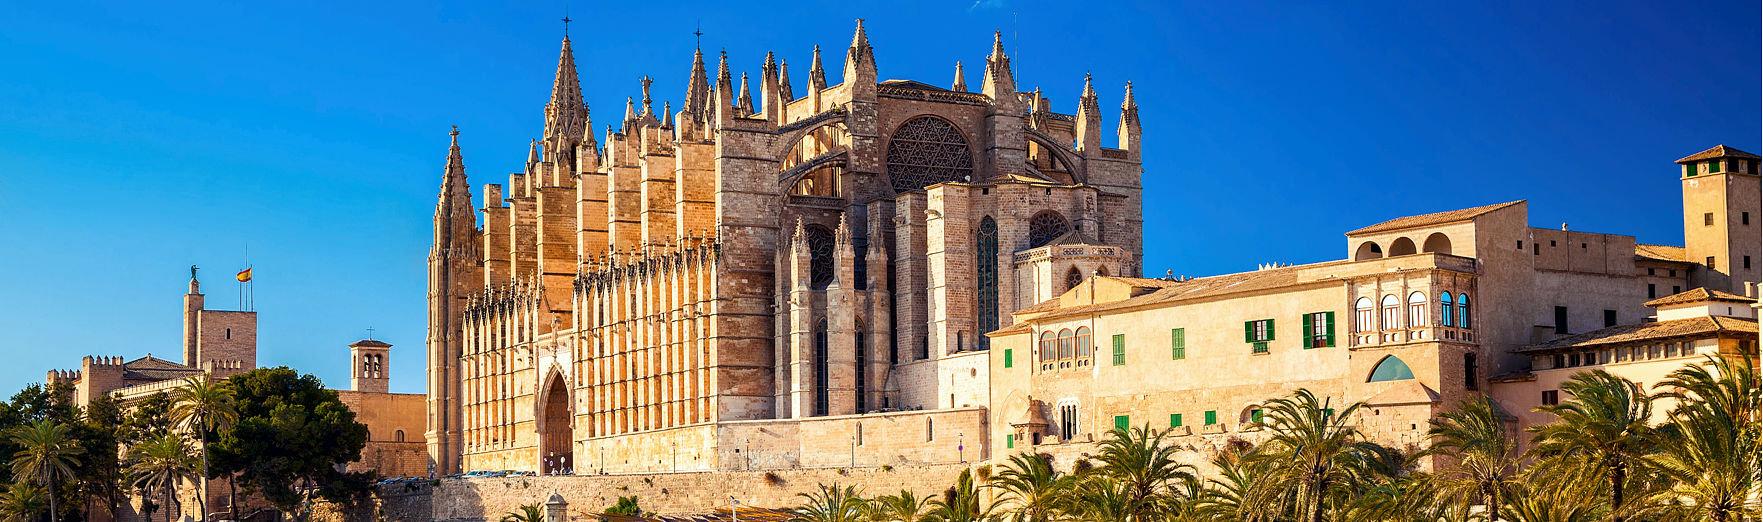 Kathedrale von Santa Maria von Palma und Parc del Marpalma